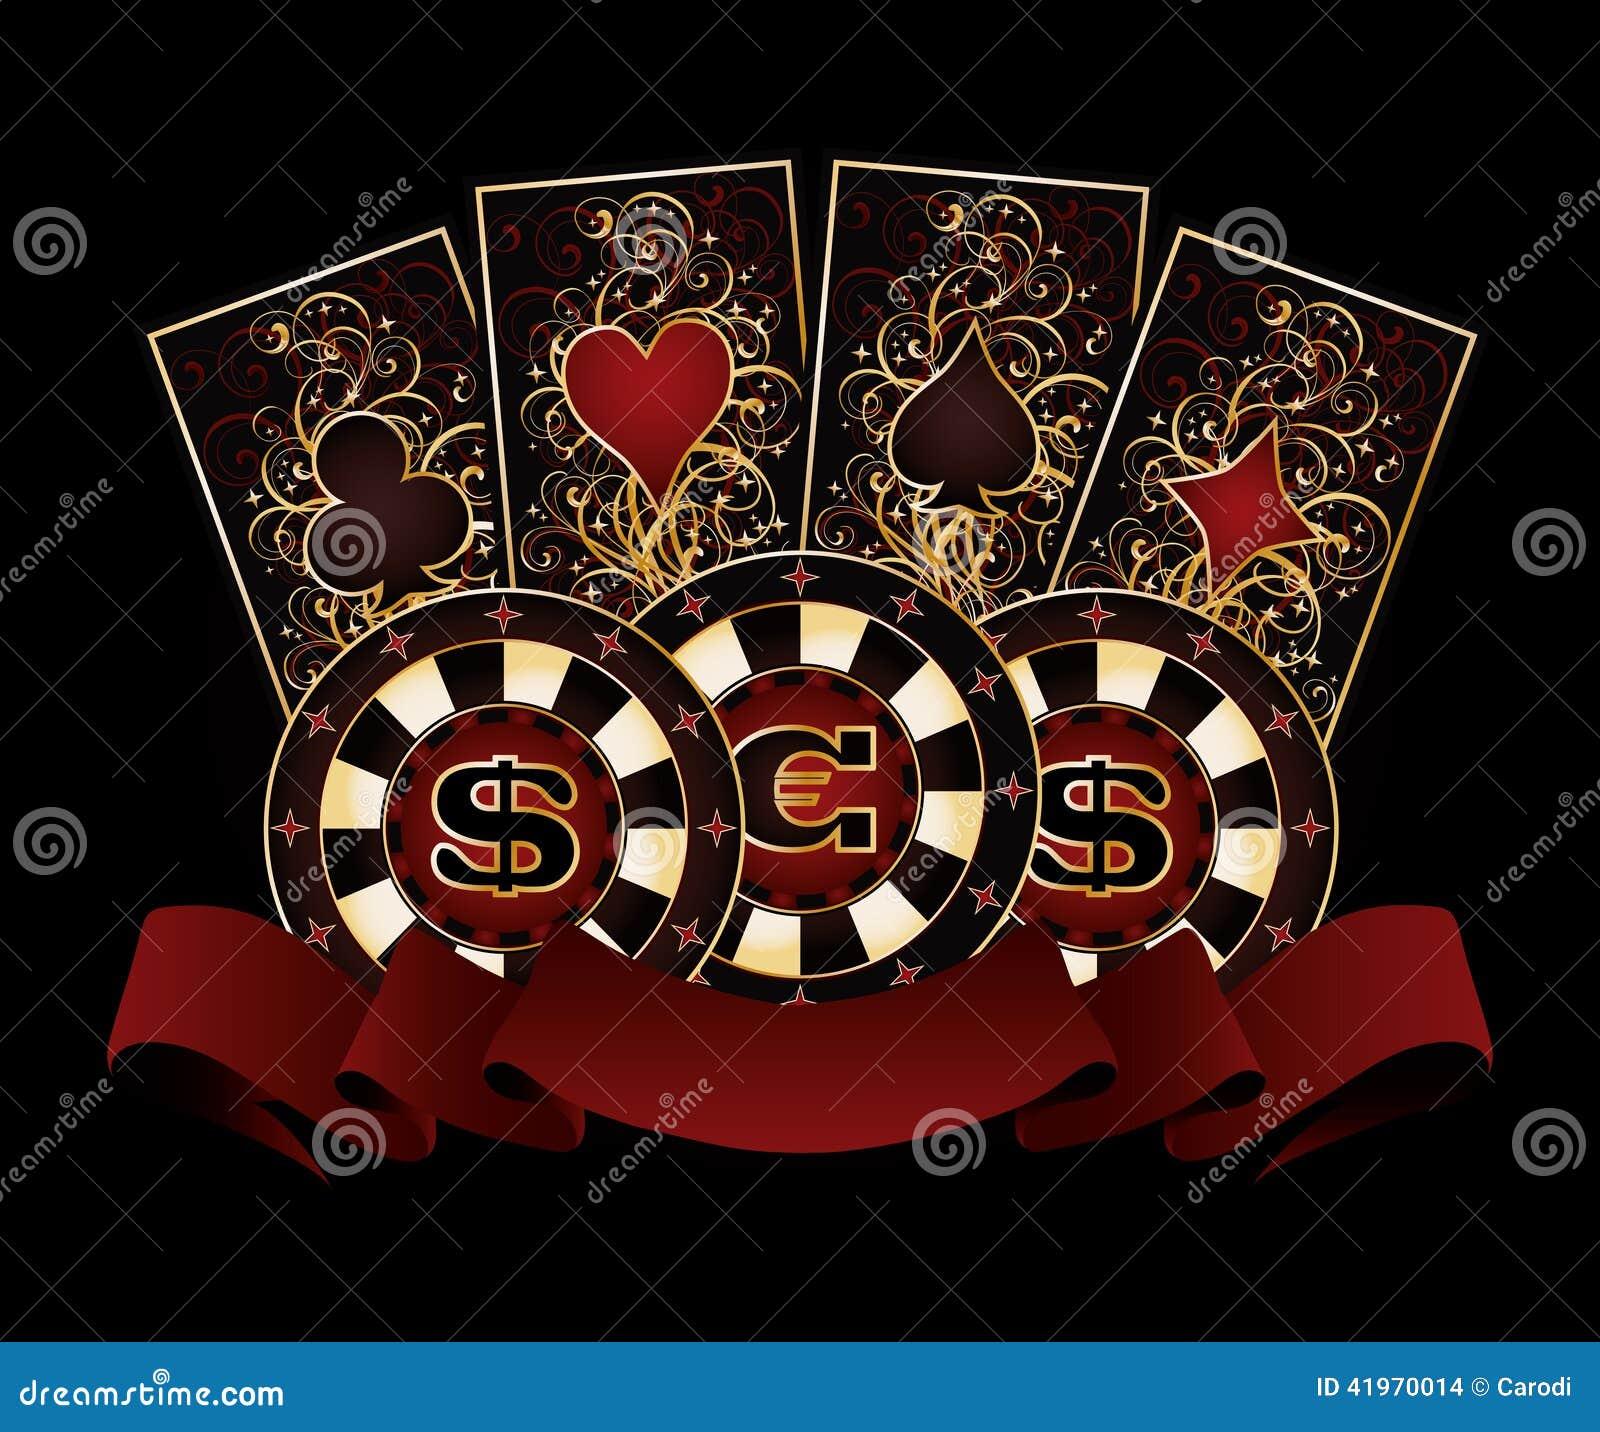 Gaming Club Casino Review 2018  AU350 Bonus FREE!